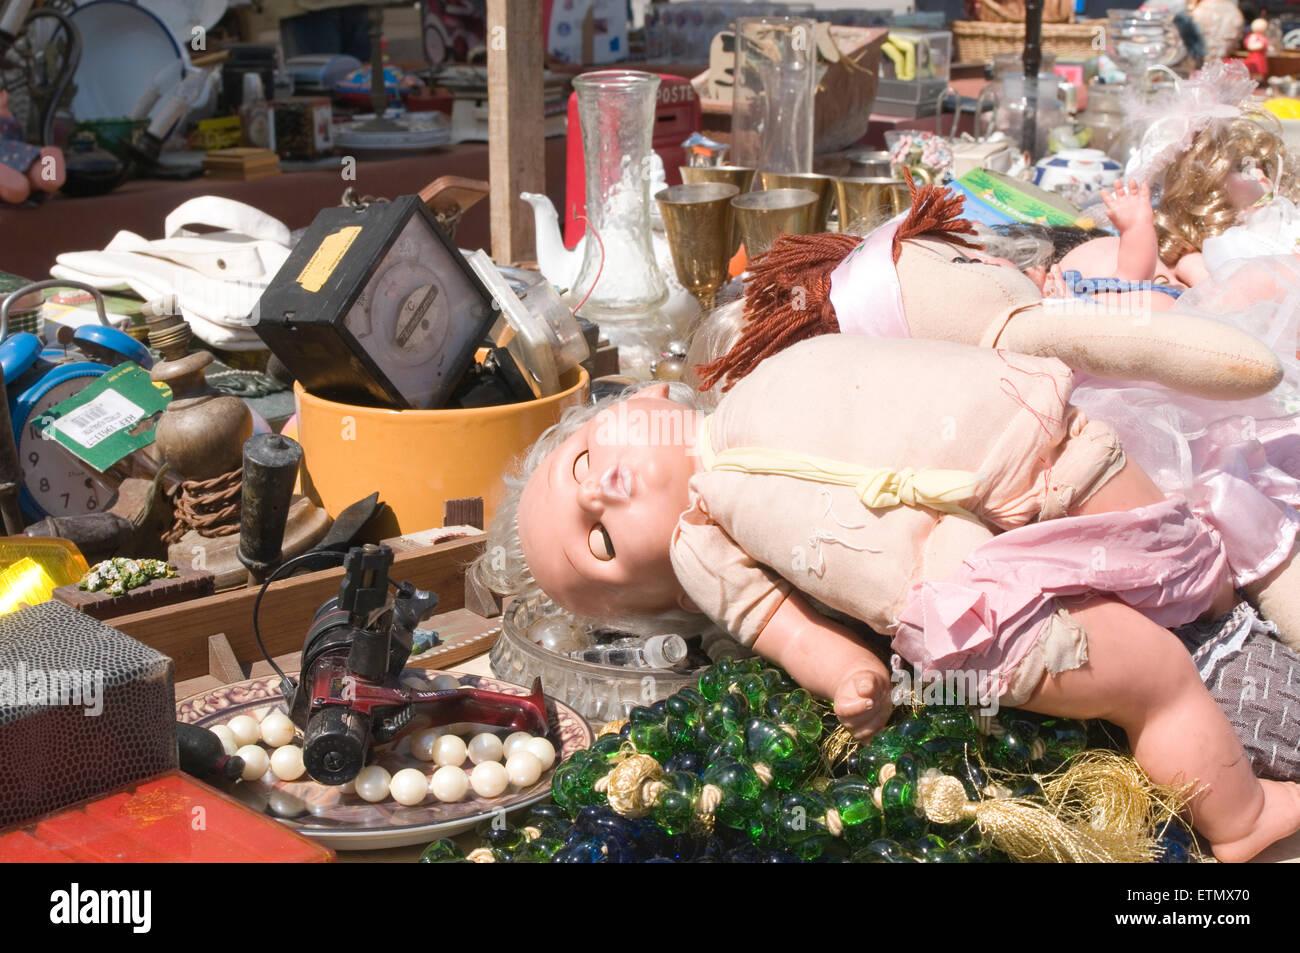 jumblesale sale sales jumble junk table top flee market junk yard yardsale market car boot carboot - Stock Image